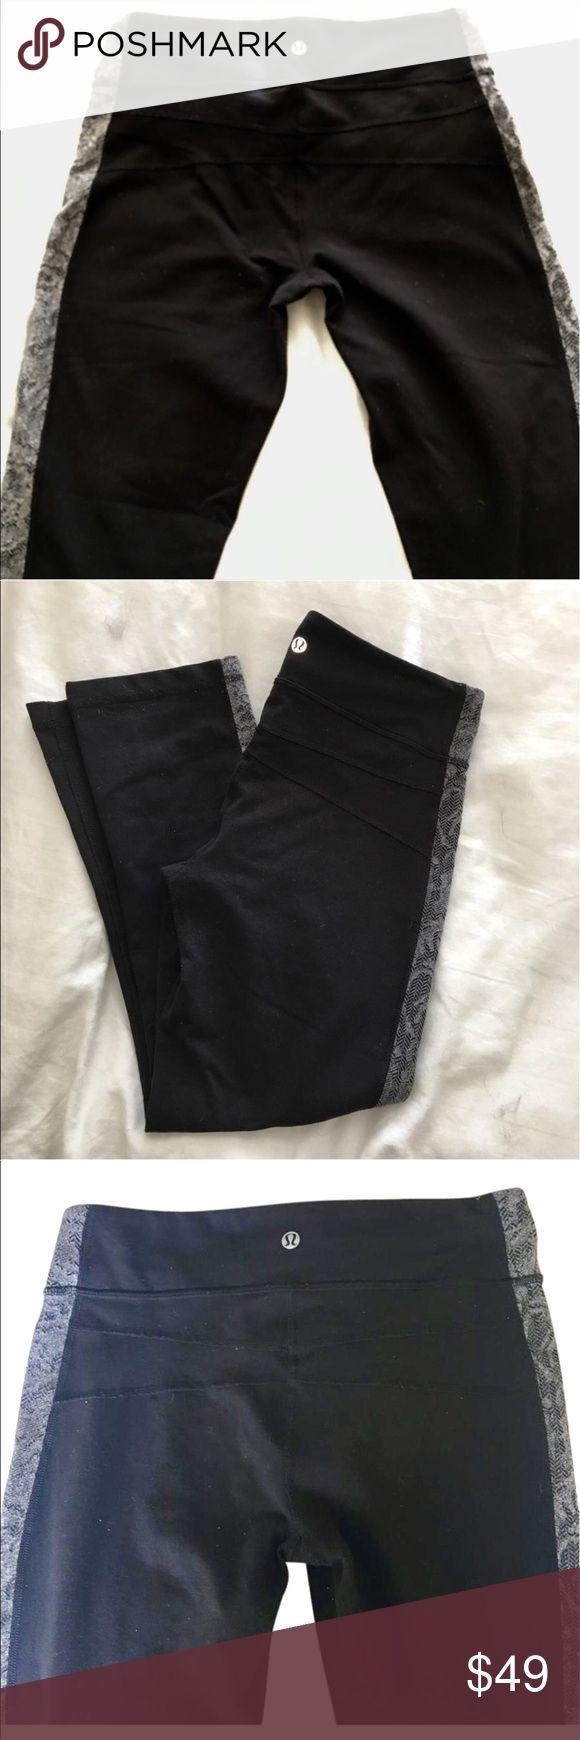 🍋 lululemon 🍋 crop leggings 🍋 lululemon 🍋 crop leggings lululemon athletica Pants Leggings